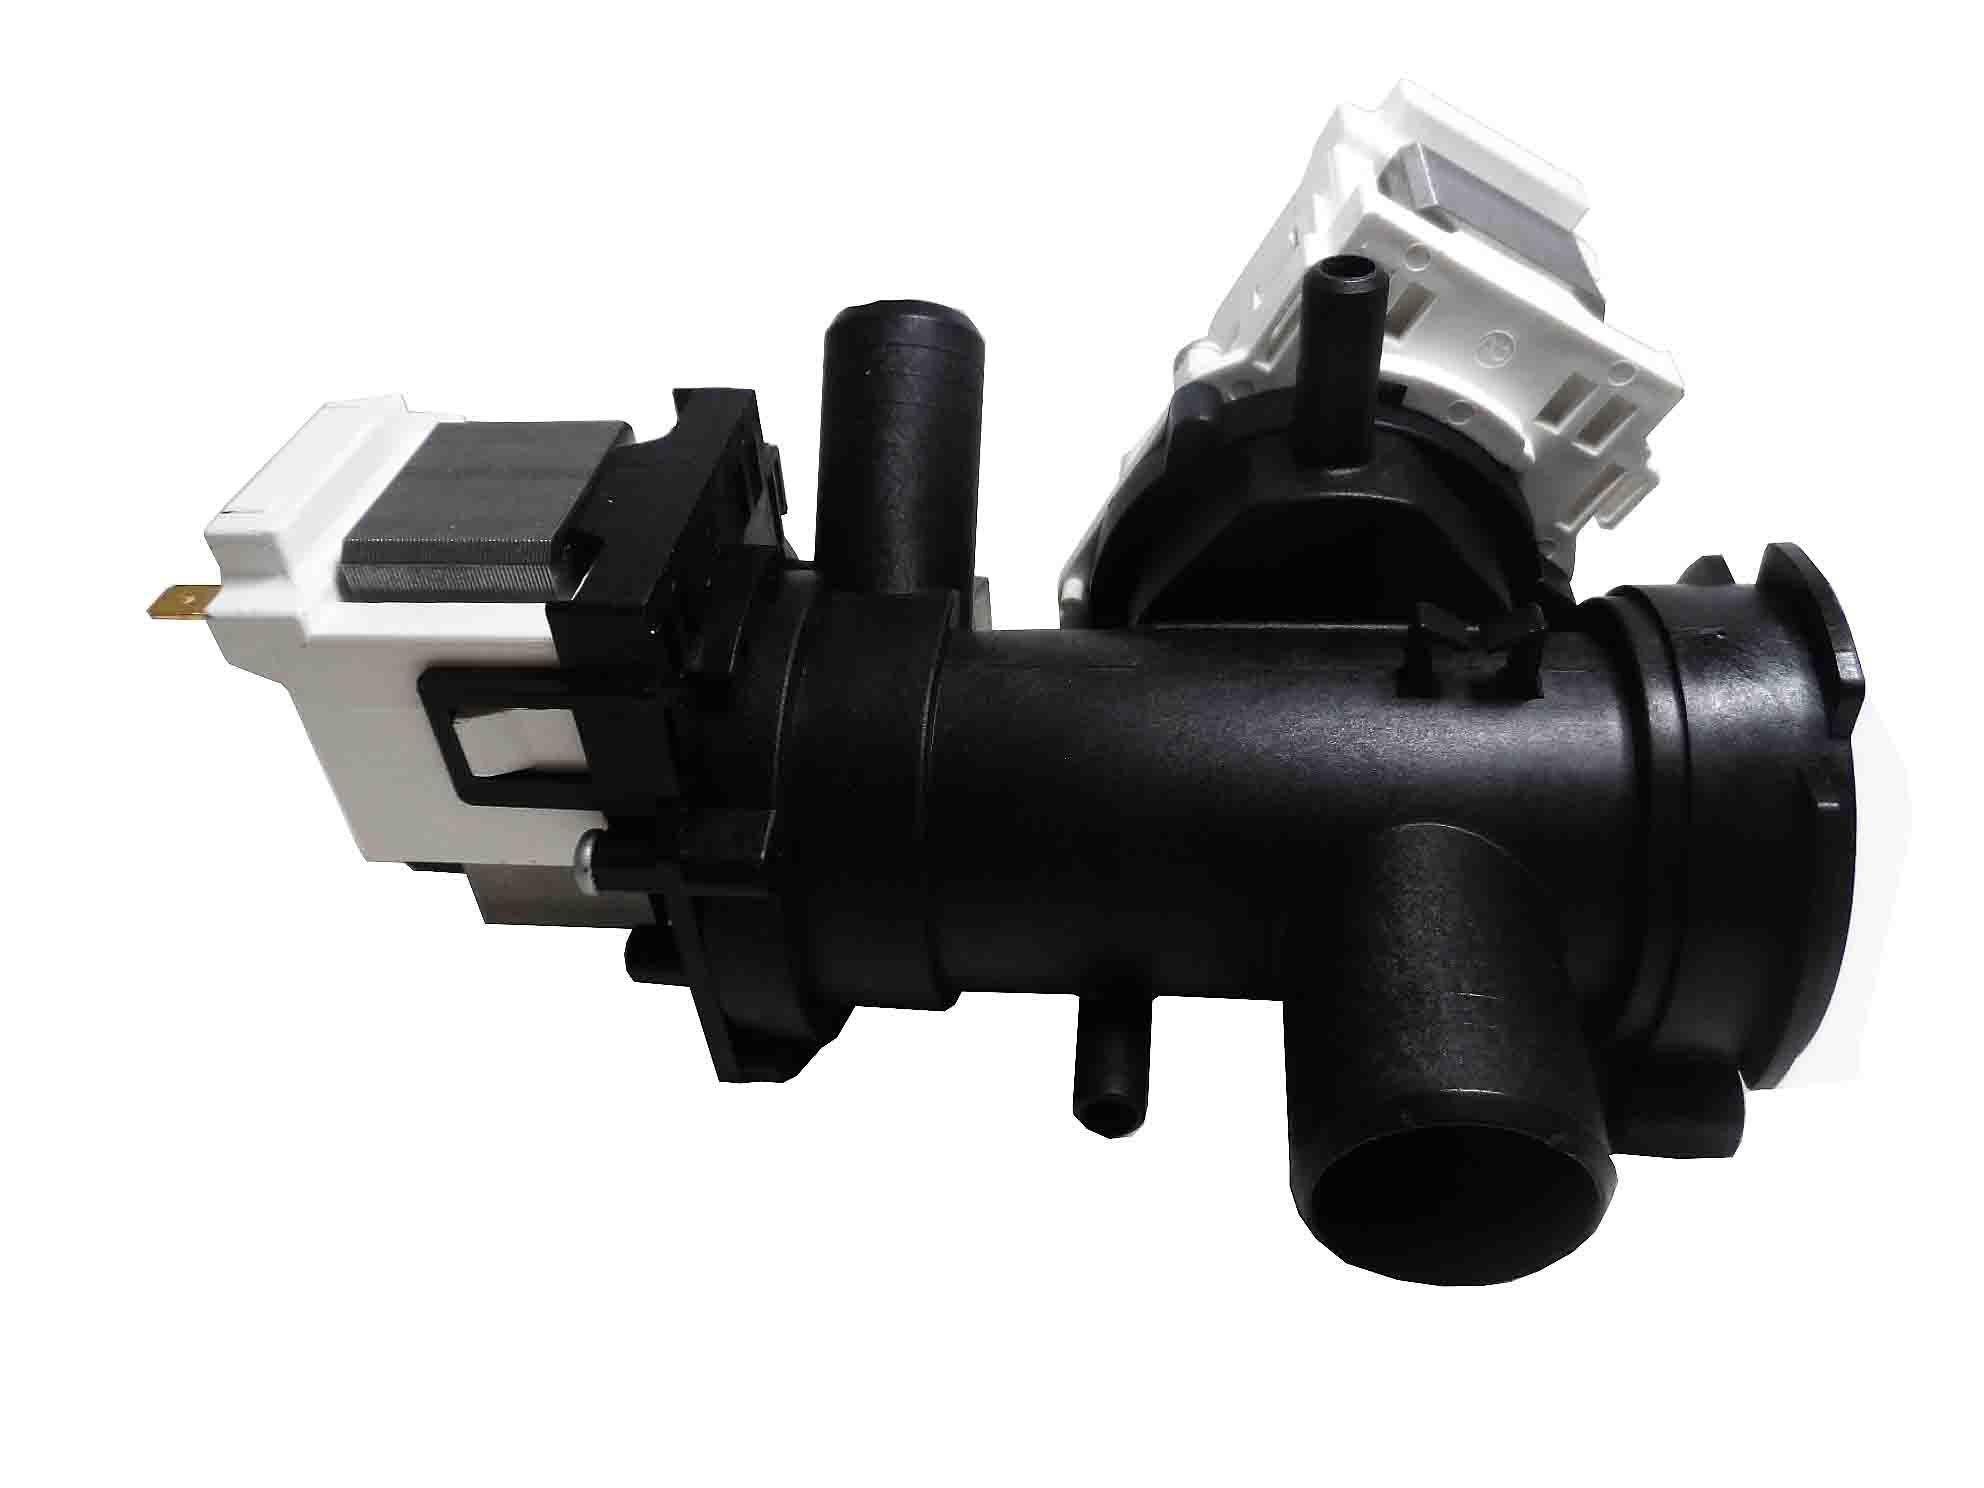 Eletrobomba Lava seca 220V Electrolux LSE09 36189M1500